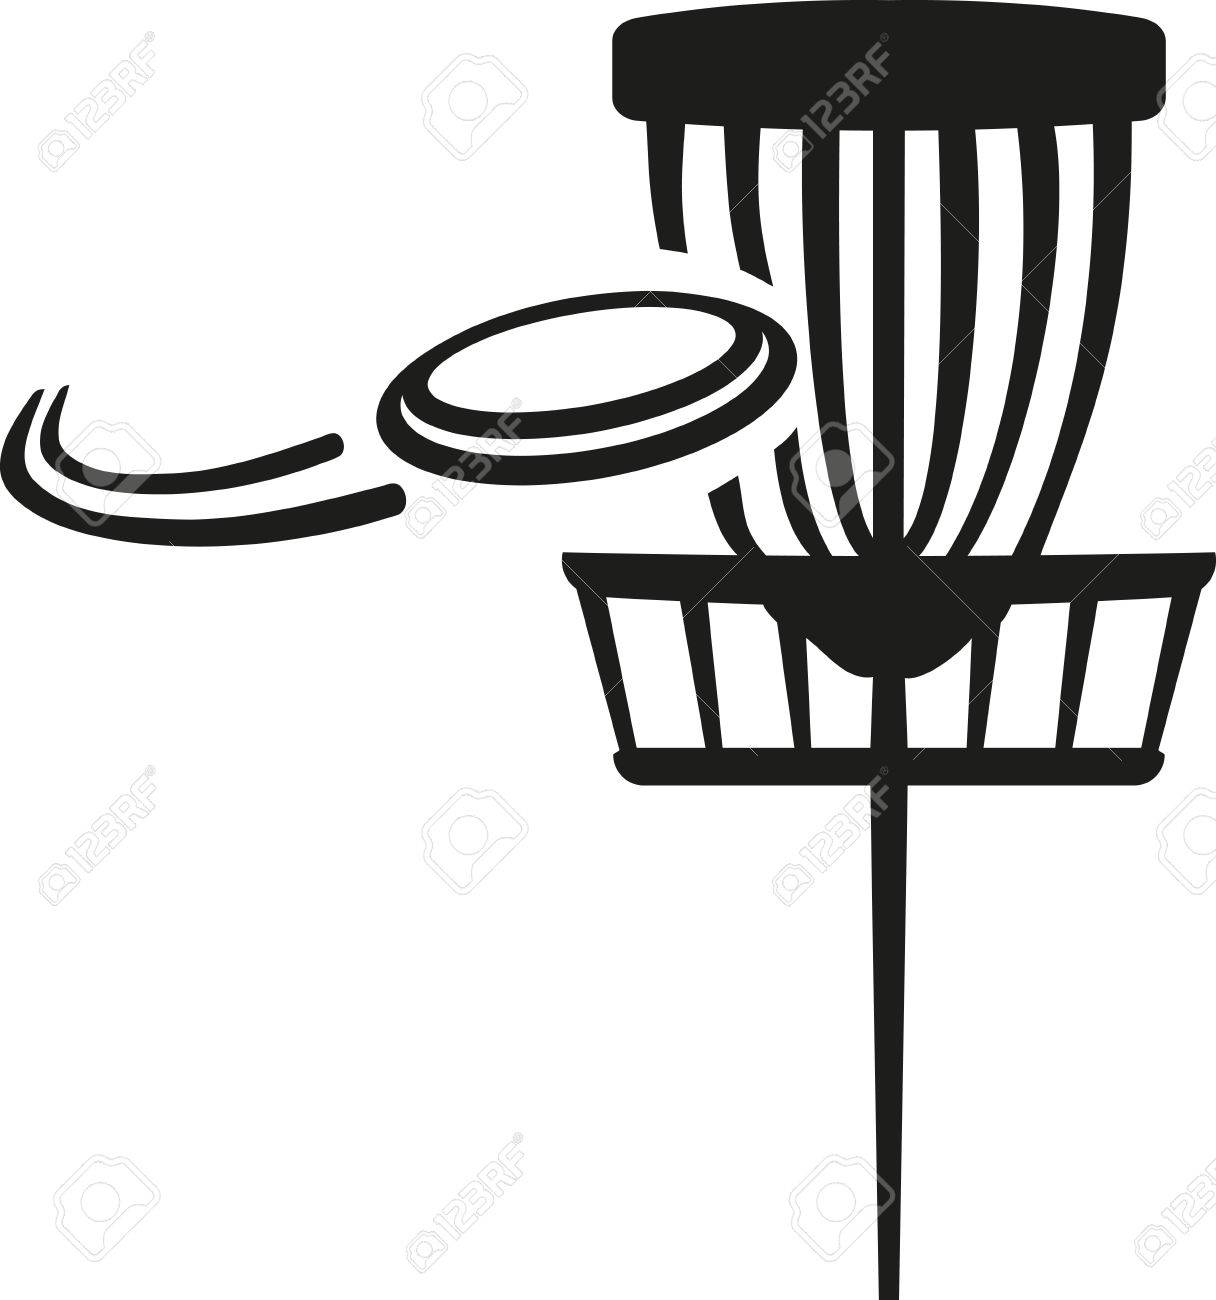 Disc golf basket with flying disk - 49616201